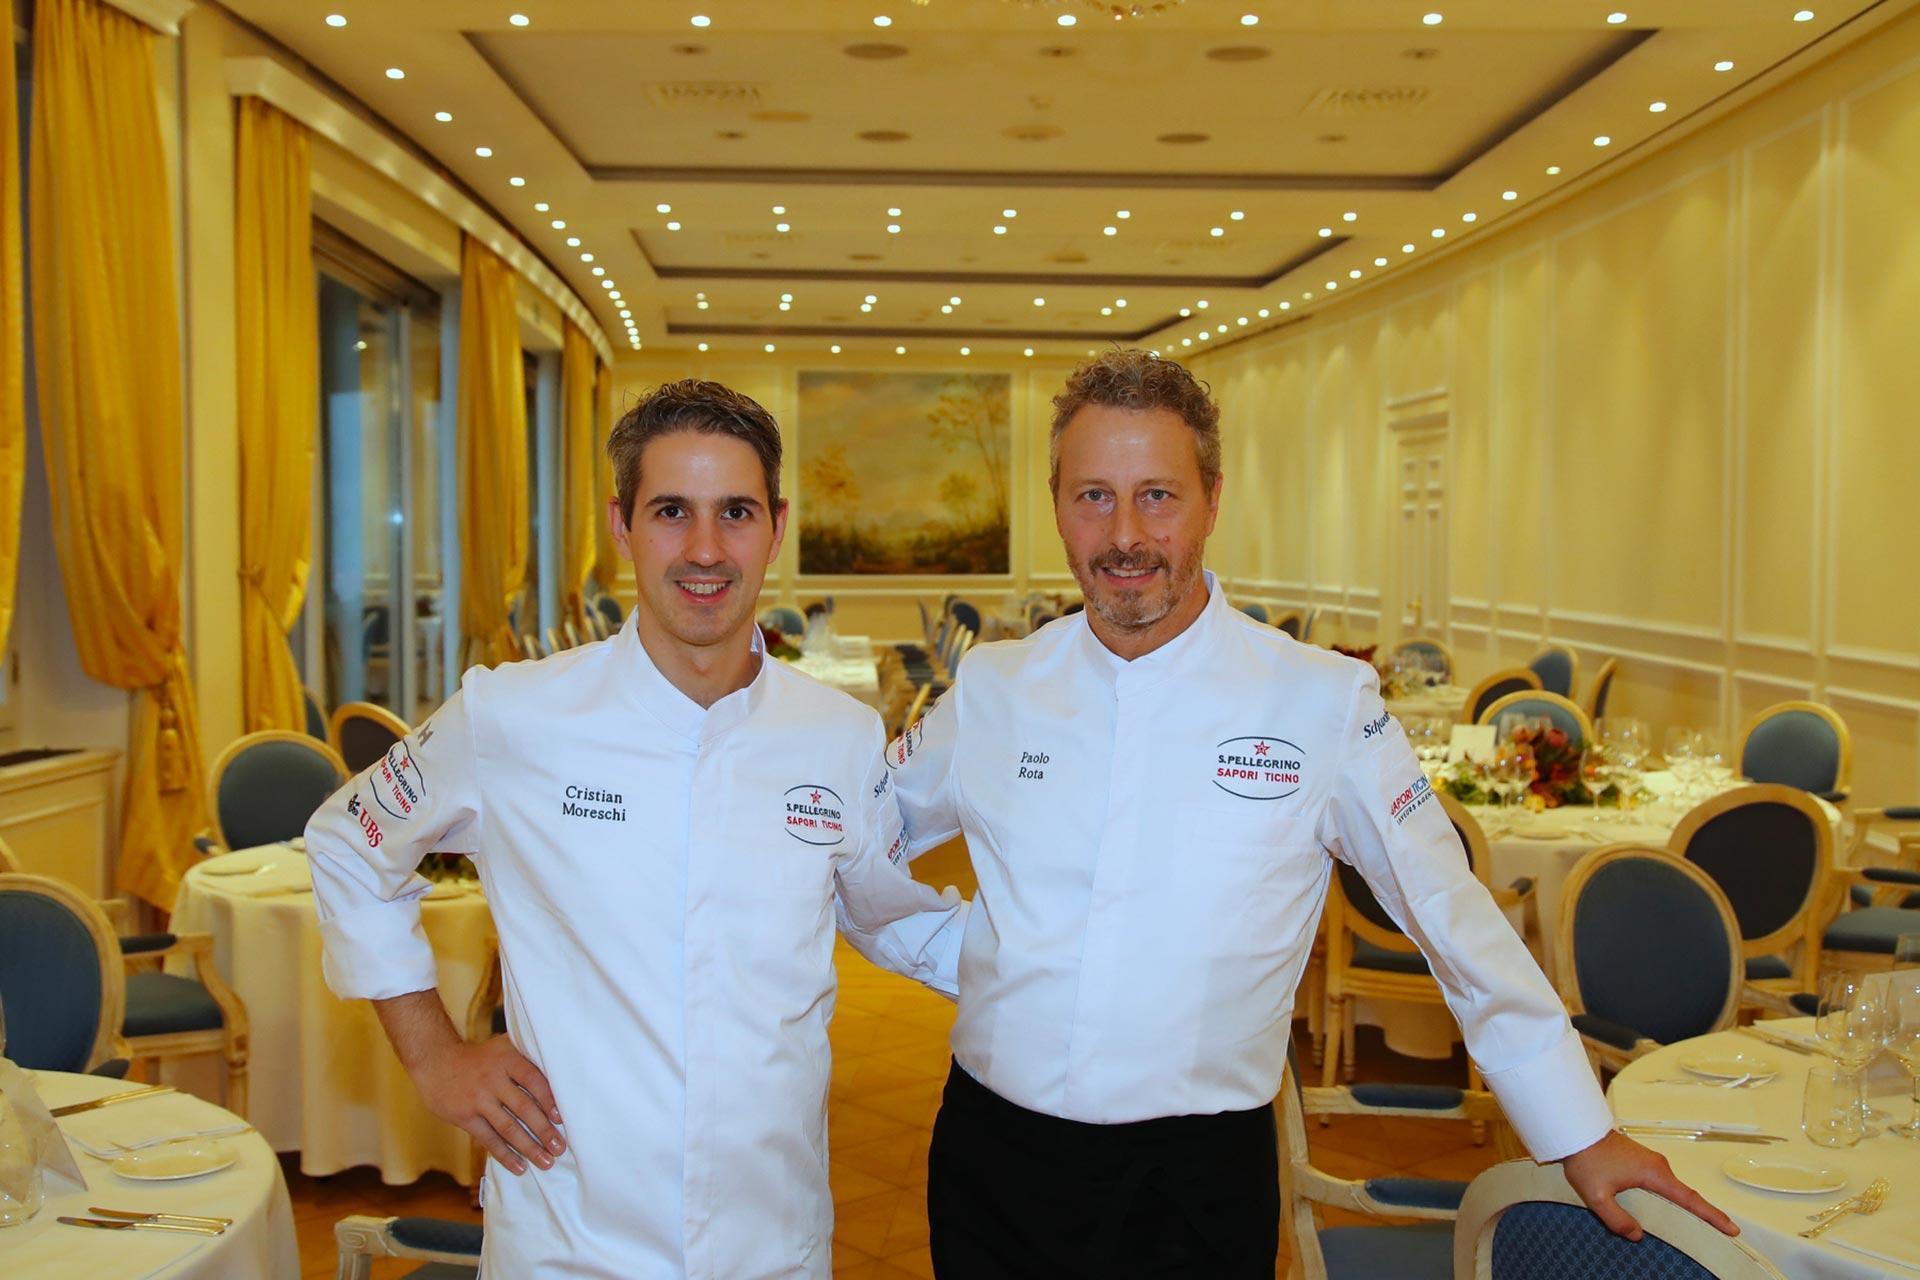 Chef Paolo Rota Cristina Moreschi Sapori Ticino 2020